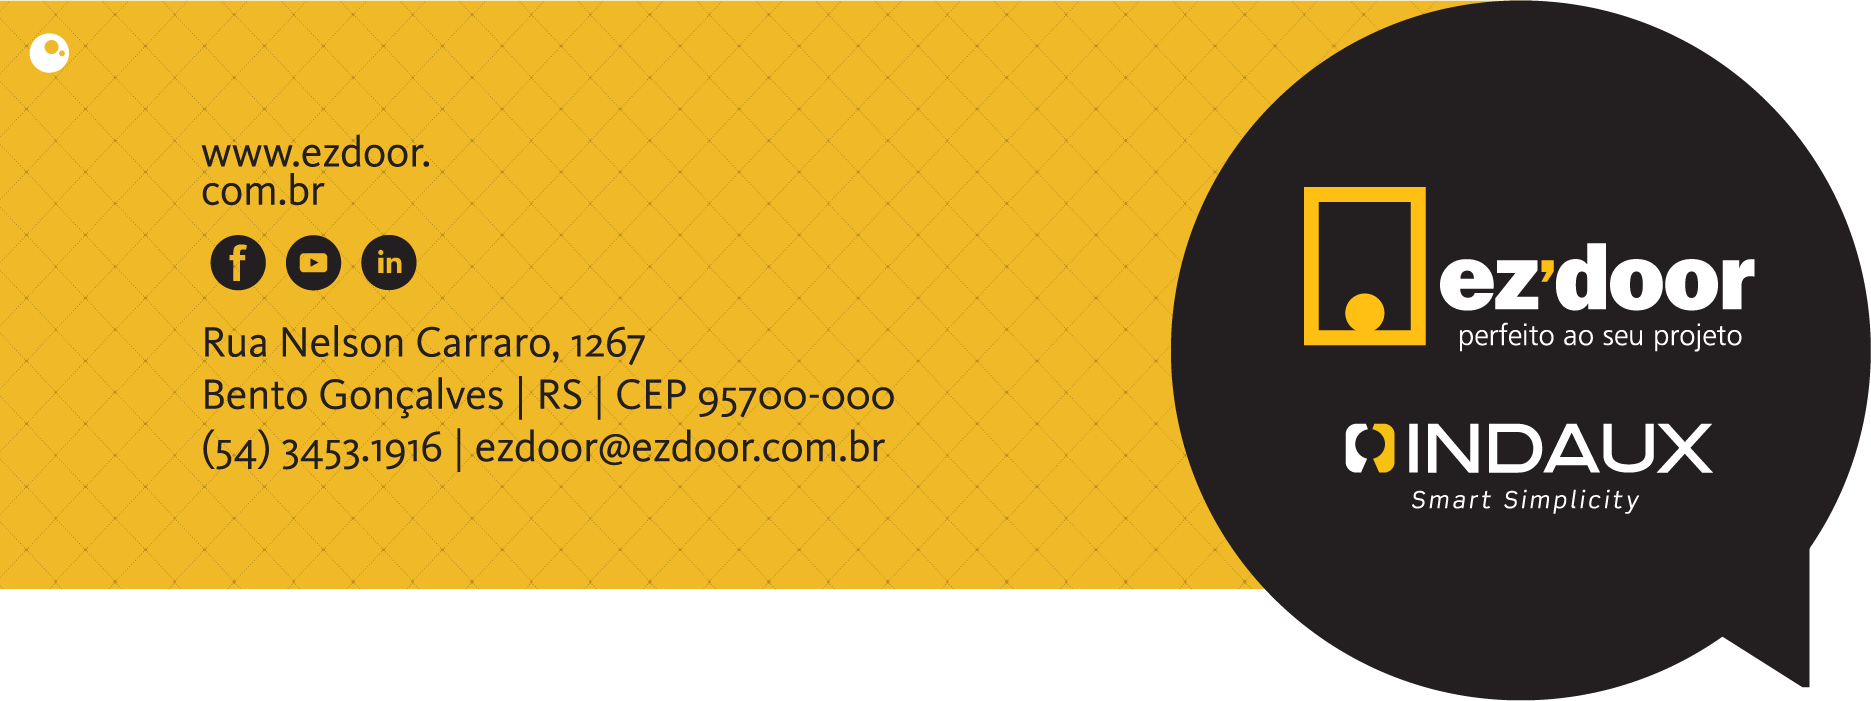 Ezdoor - Acesse nosso site e curta nosso Facebook